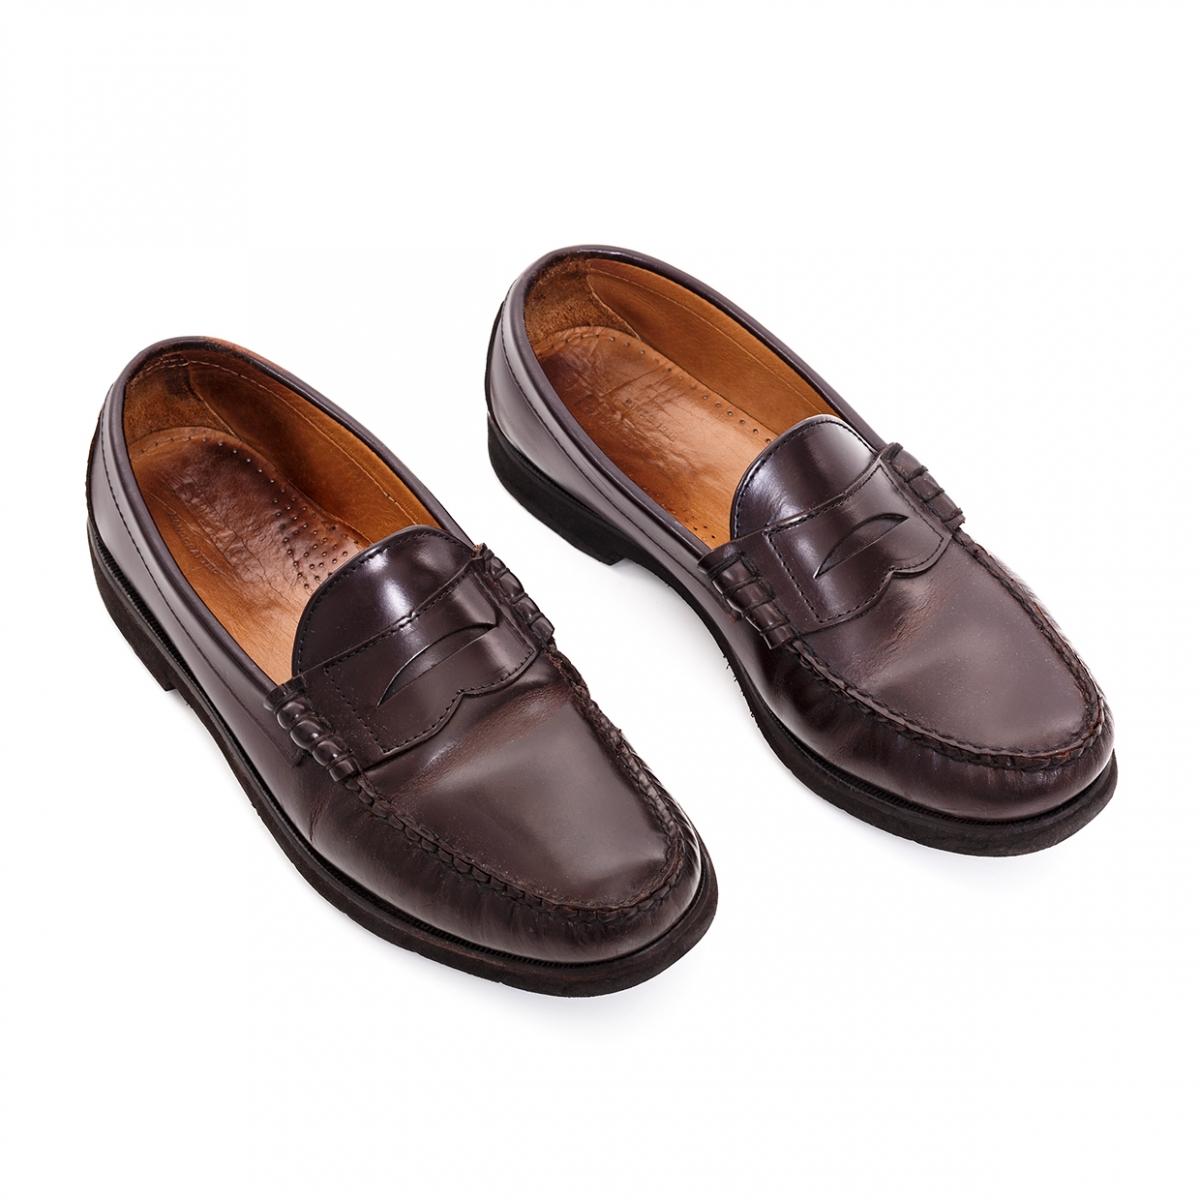 Imagen en la que se ve un par de zapatos de hombre